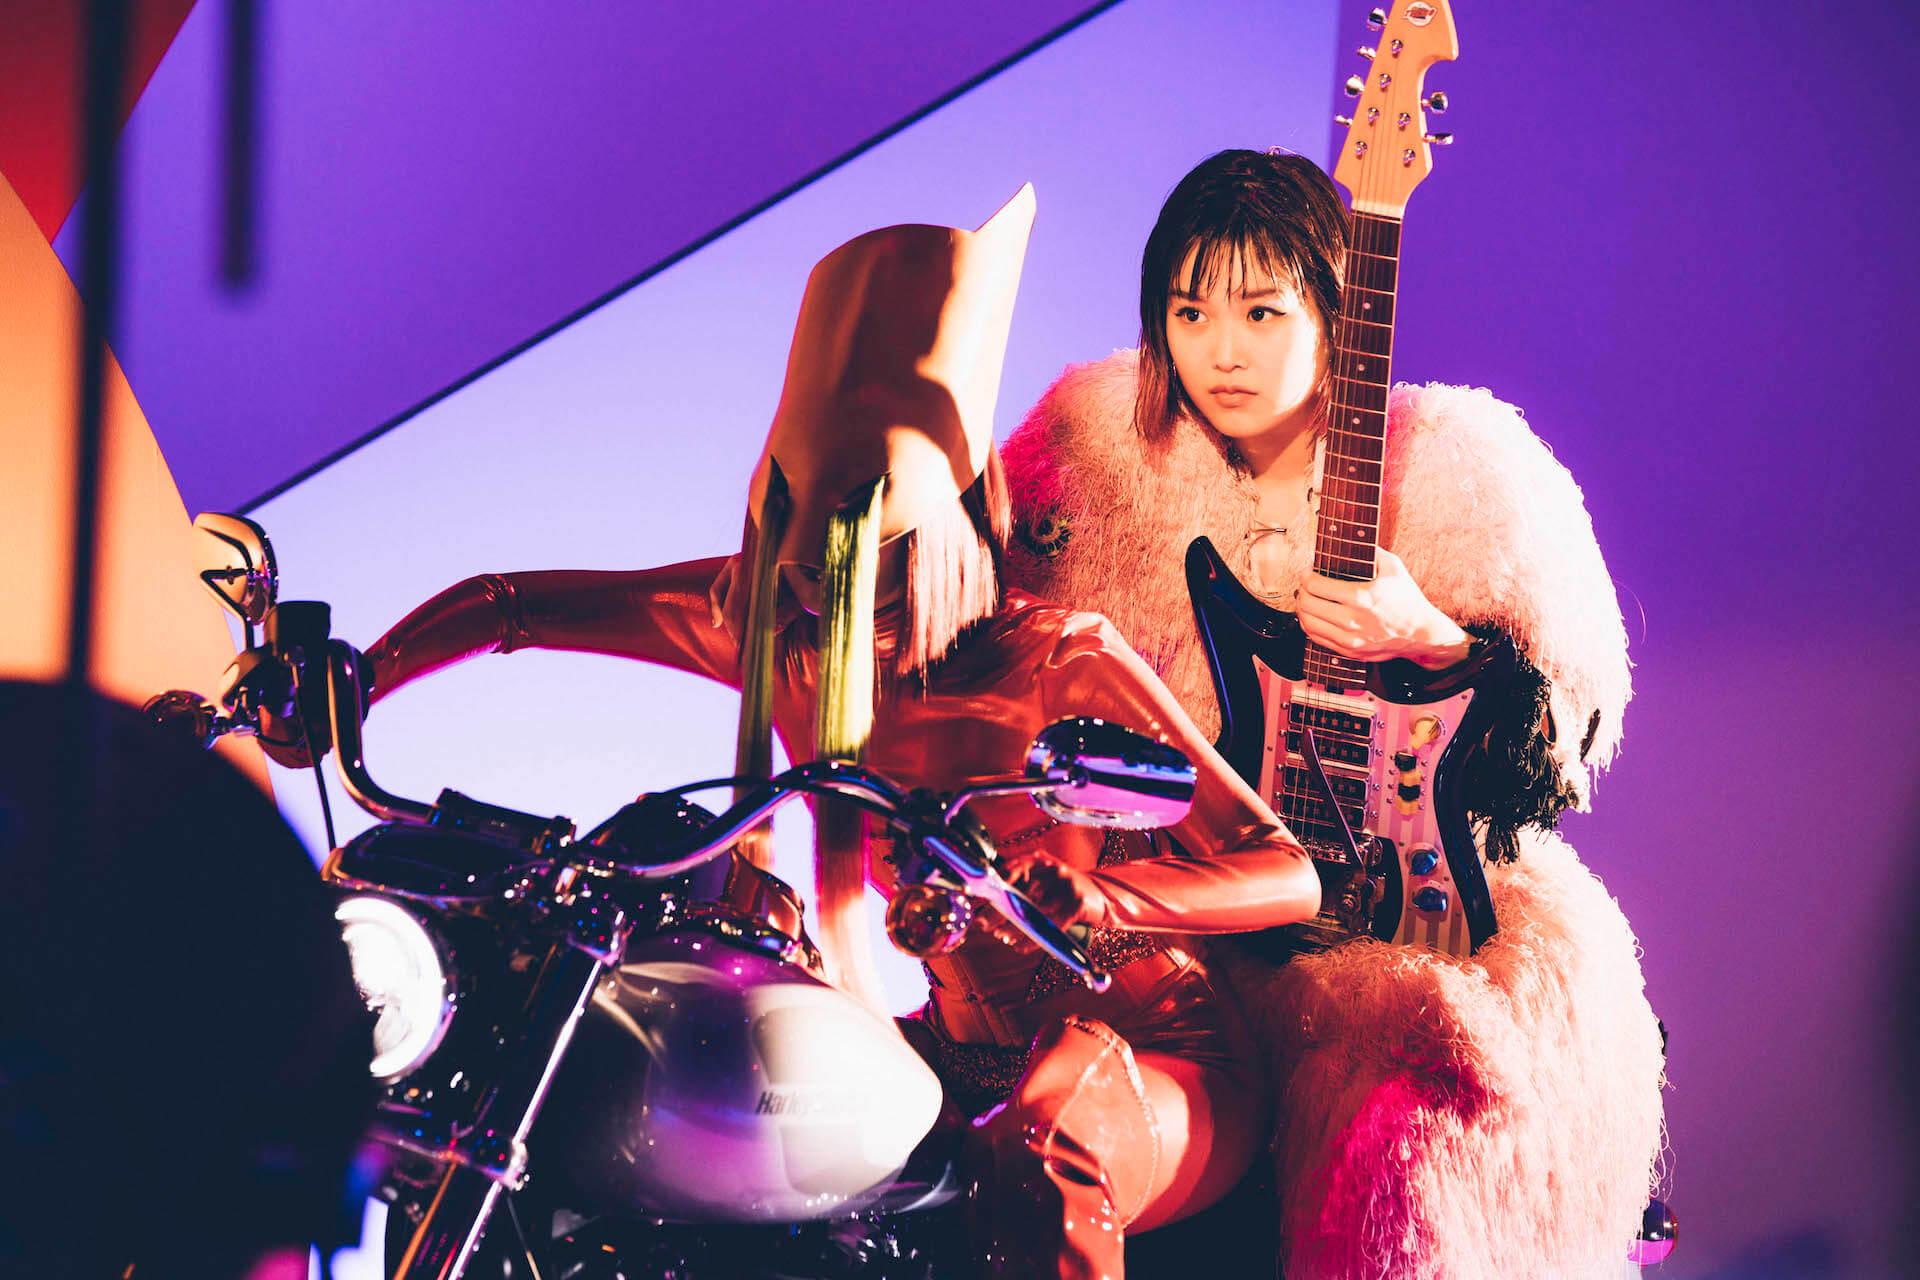 Reiの最新シングル「Territory Blues」配信開始&MVも完成!ハーレーダビッドソン × Rei によるコラボ・プロジェクト<SEEK for SOUL>オリジナル楽曲 music190919-rei-harley-davidson-4